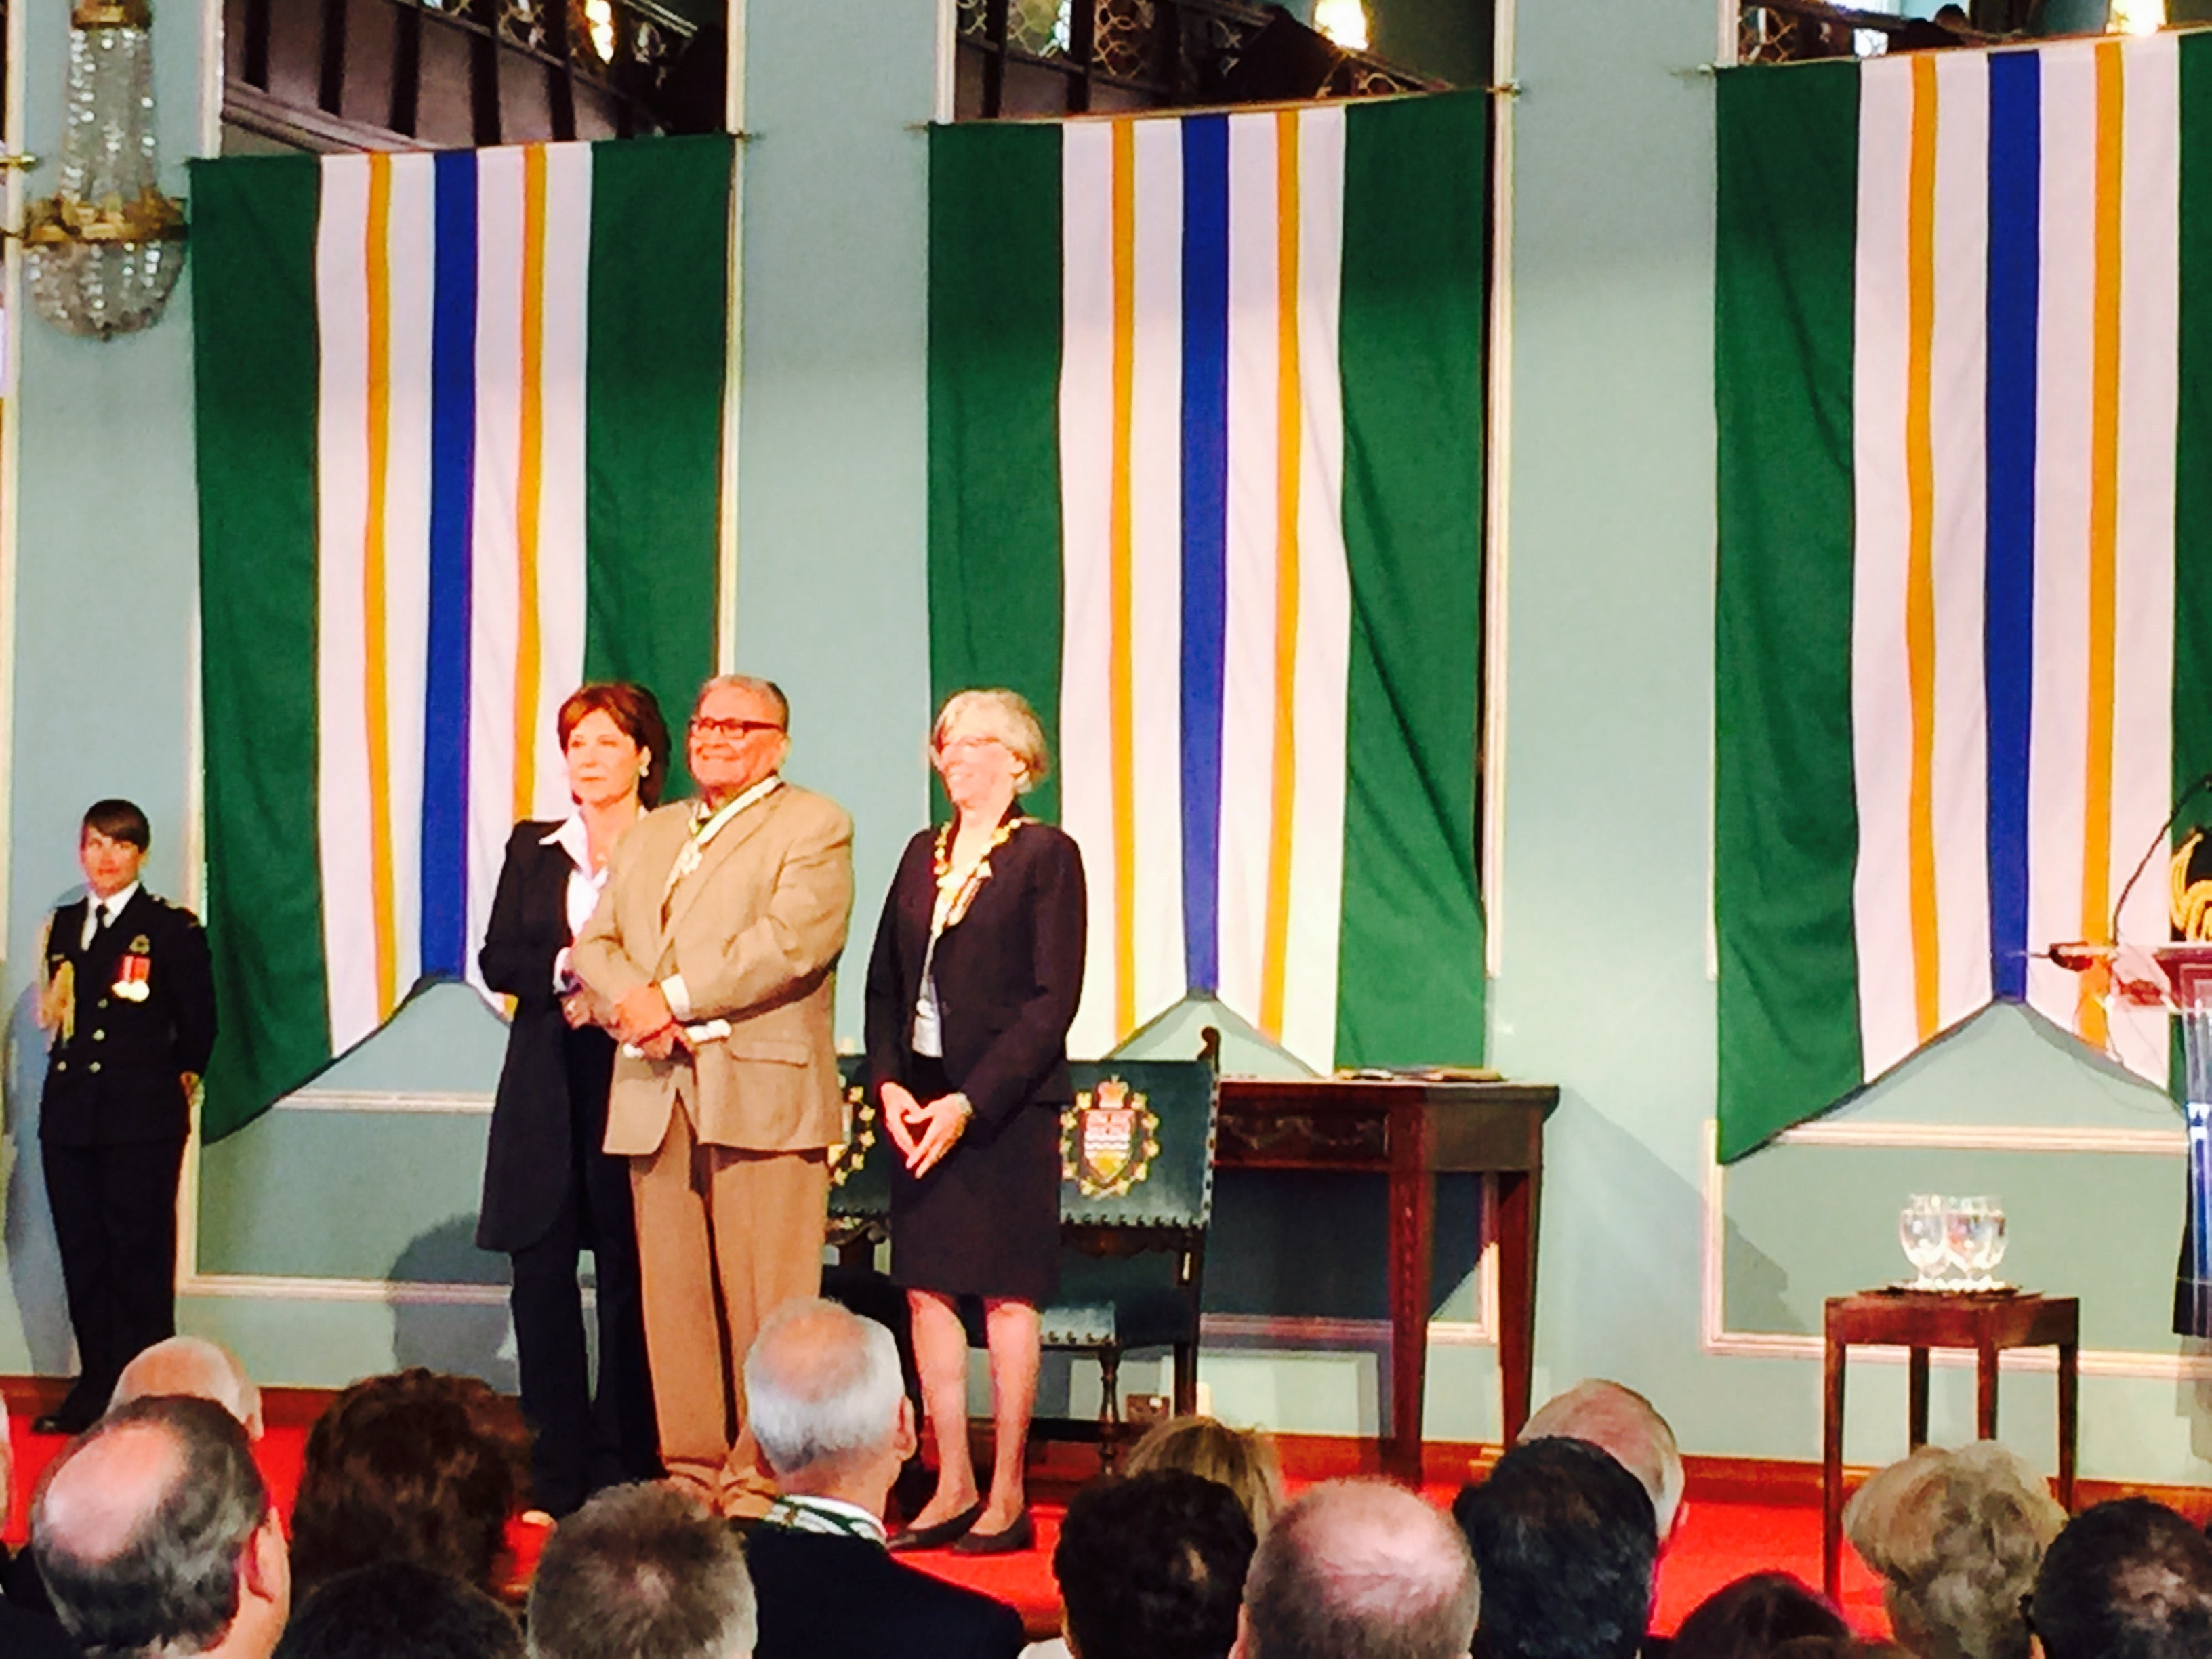 Chief Robert Joseph BC Premier Christy Clark Judith Guichon Lieutenant Governor of BC